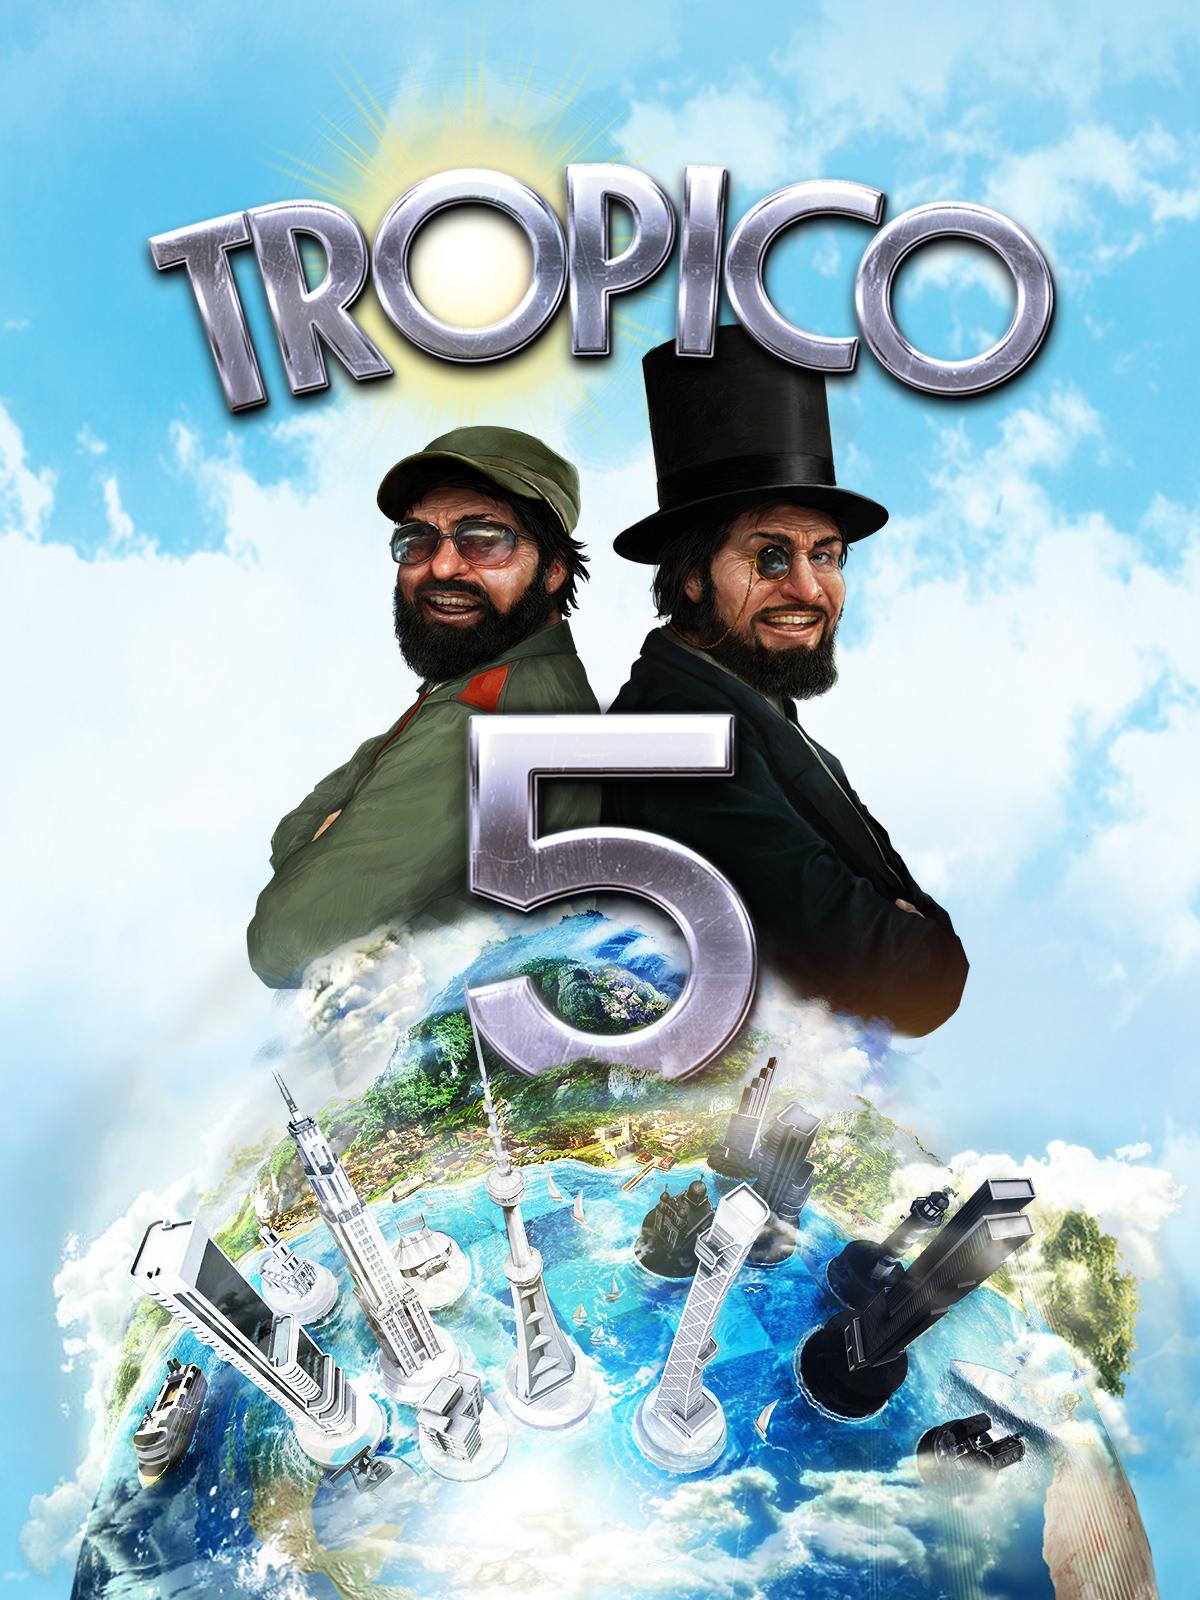 Tropico 5 kostenlos im Epic Games Store (am 23.12.)